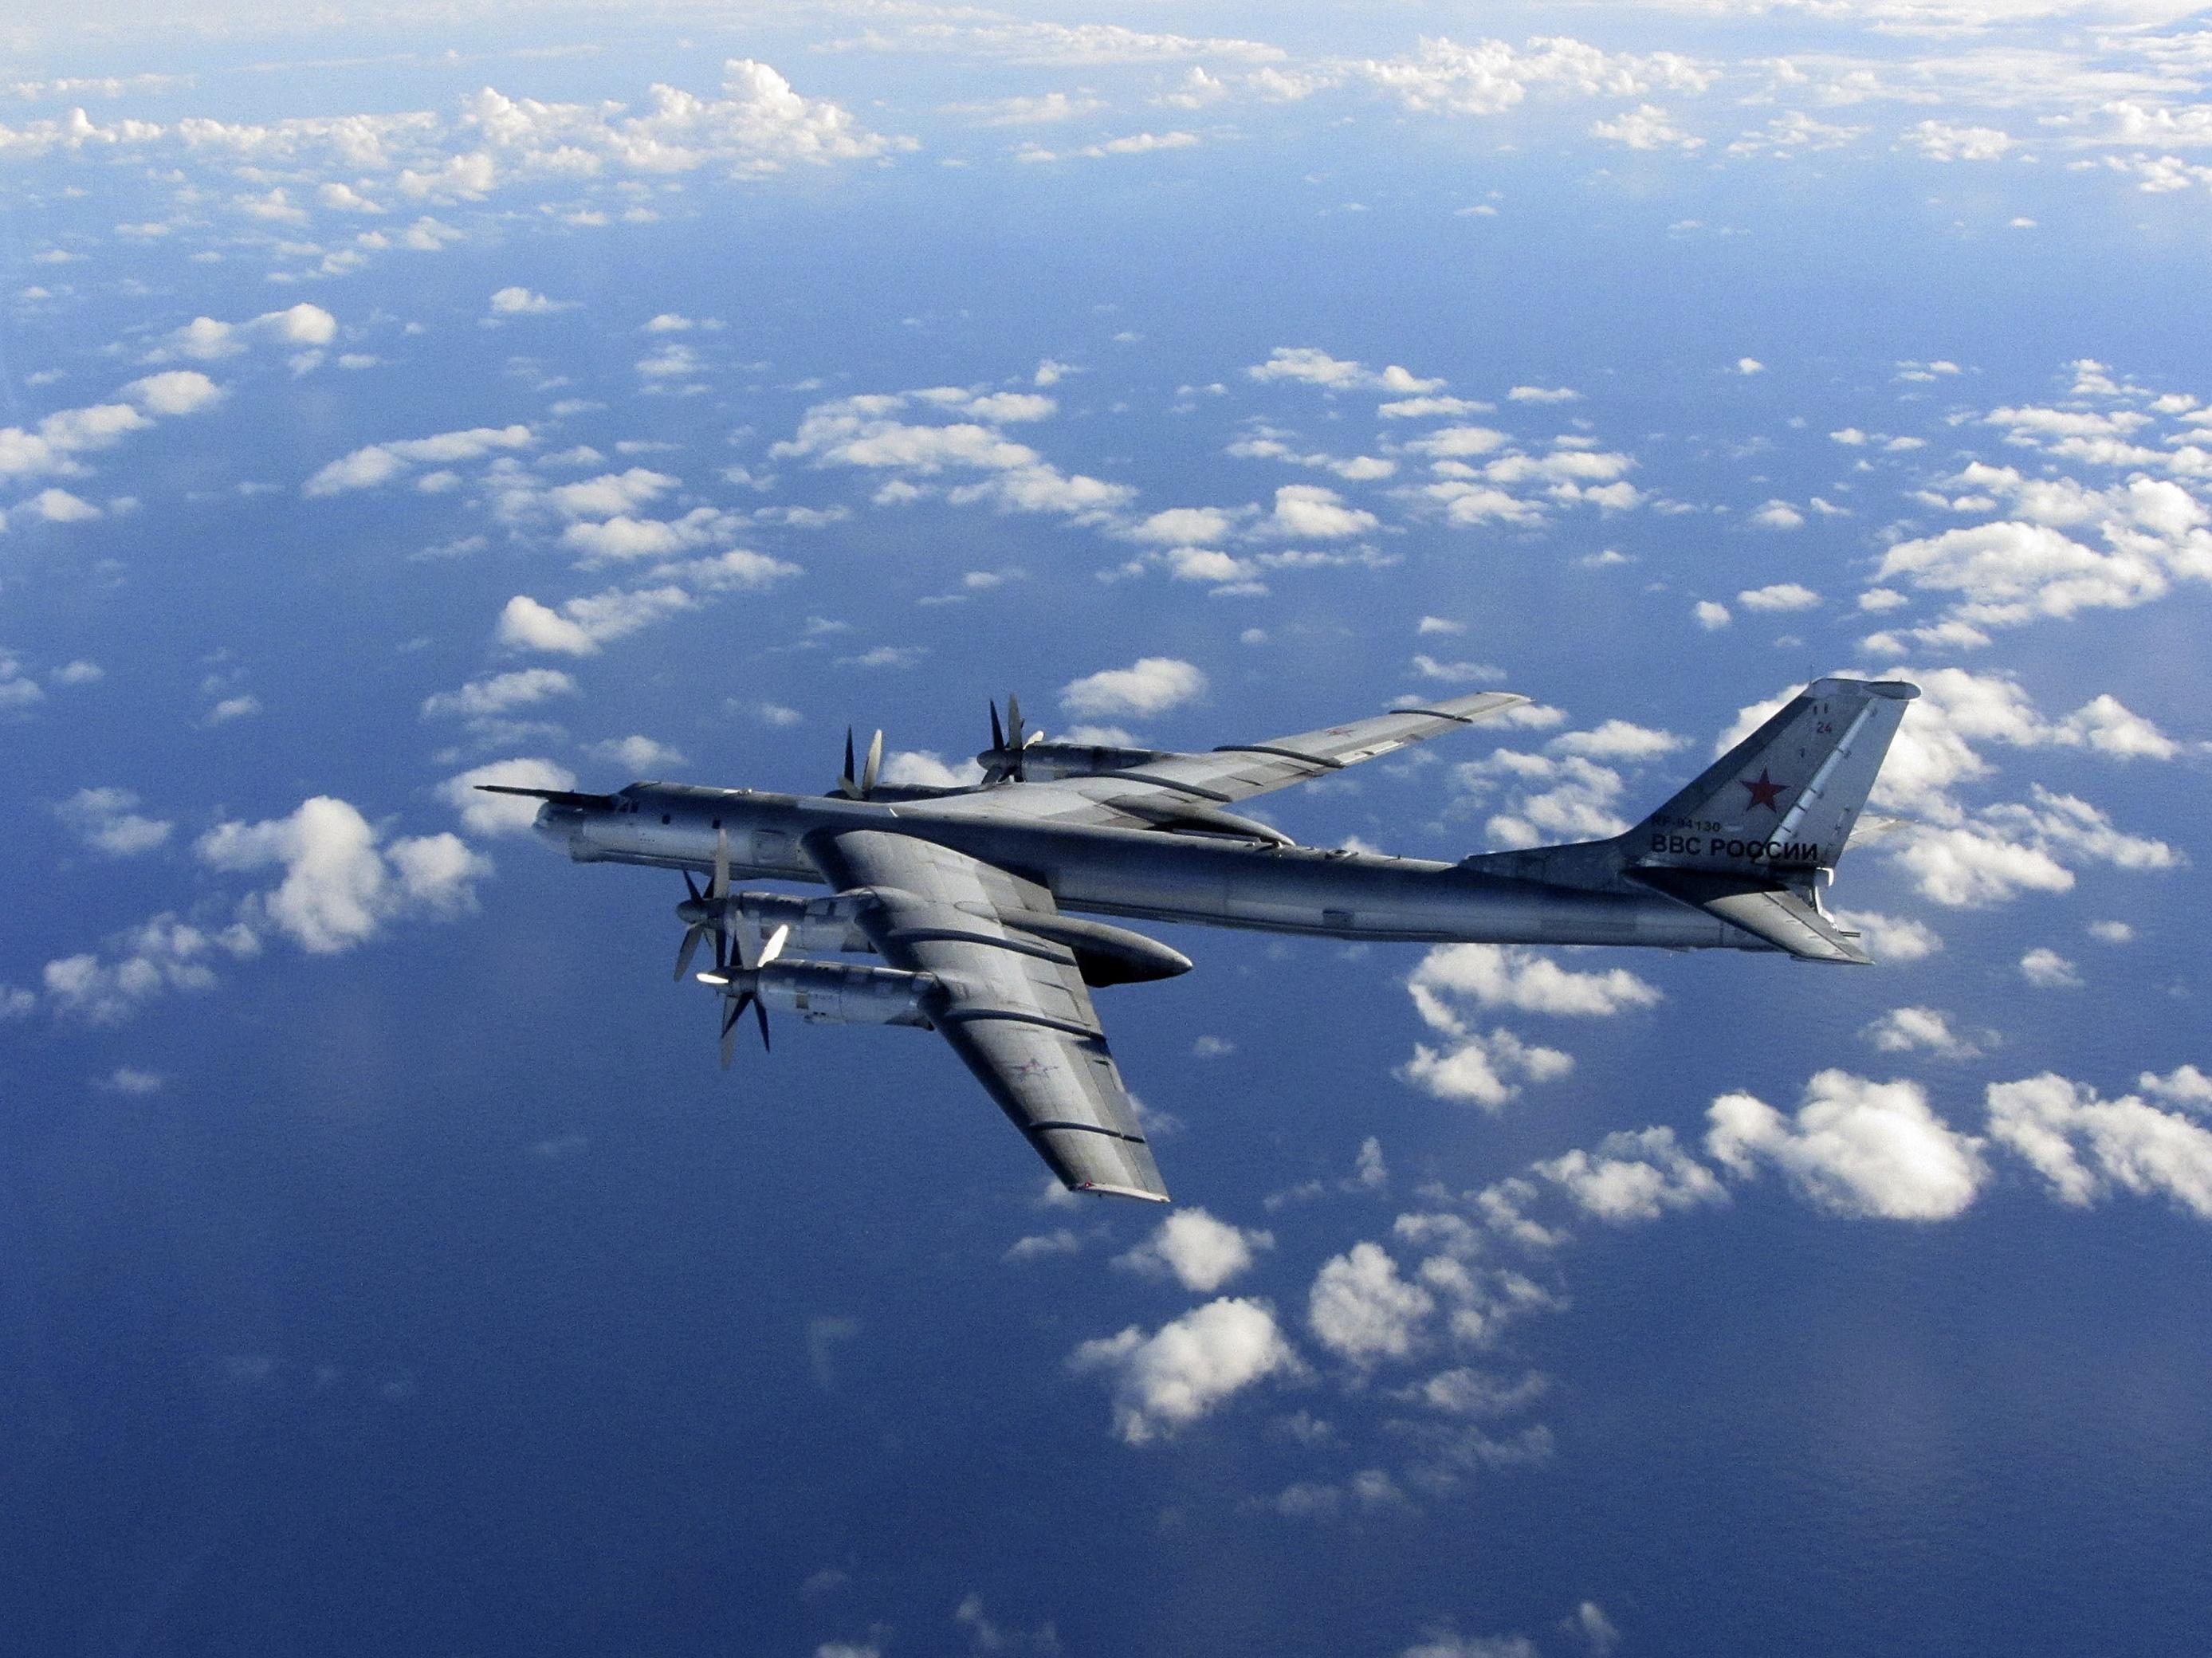 British Fighter Jets Escort Russian Bombers Away From Coast Of U.K.